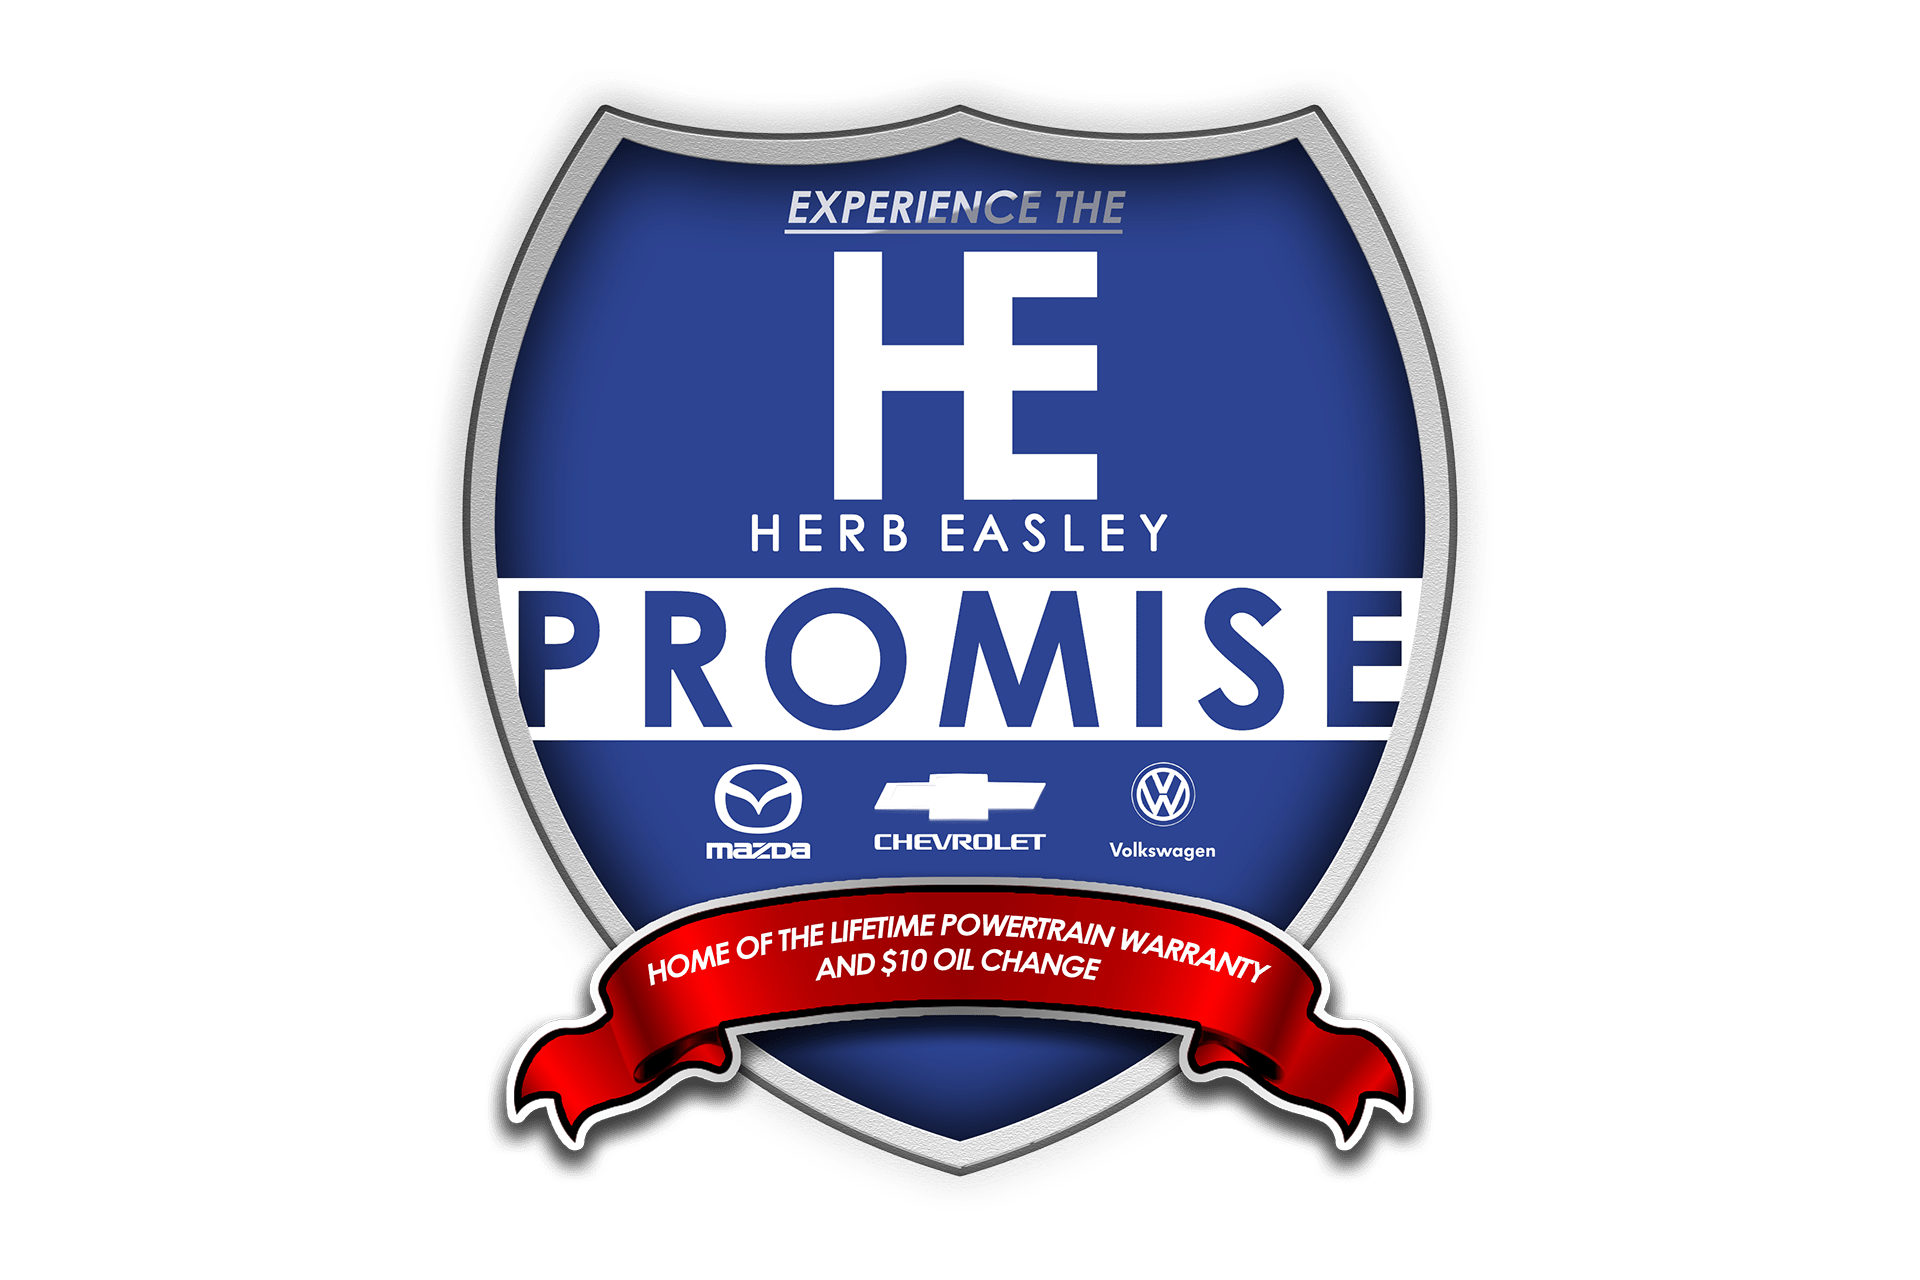 Herb Easley Promise